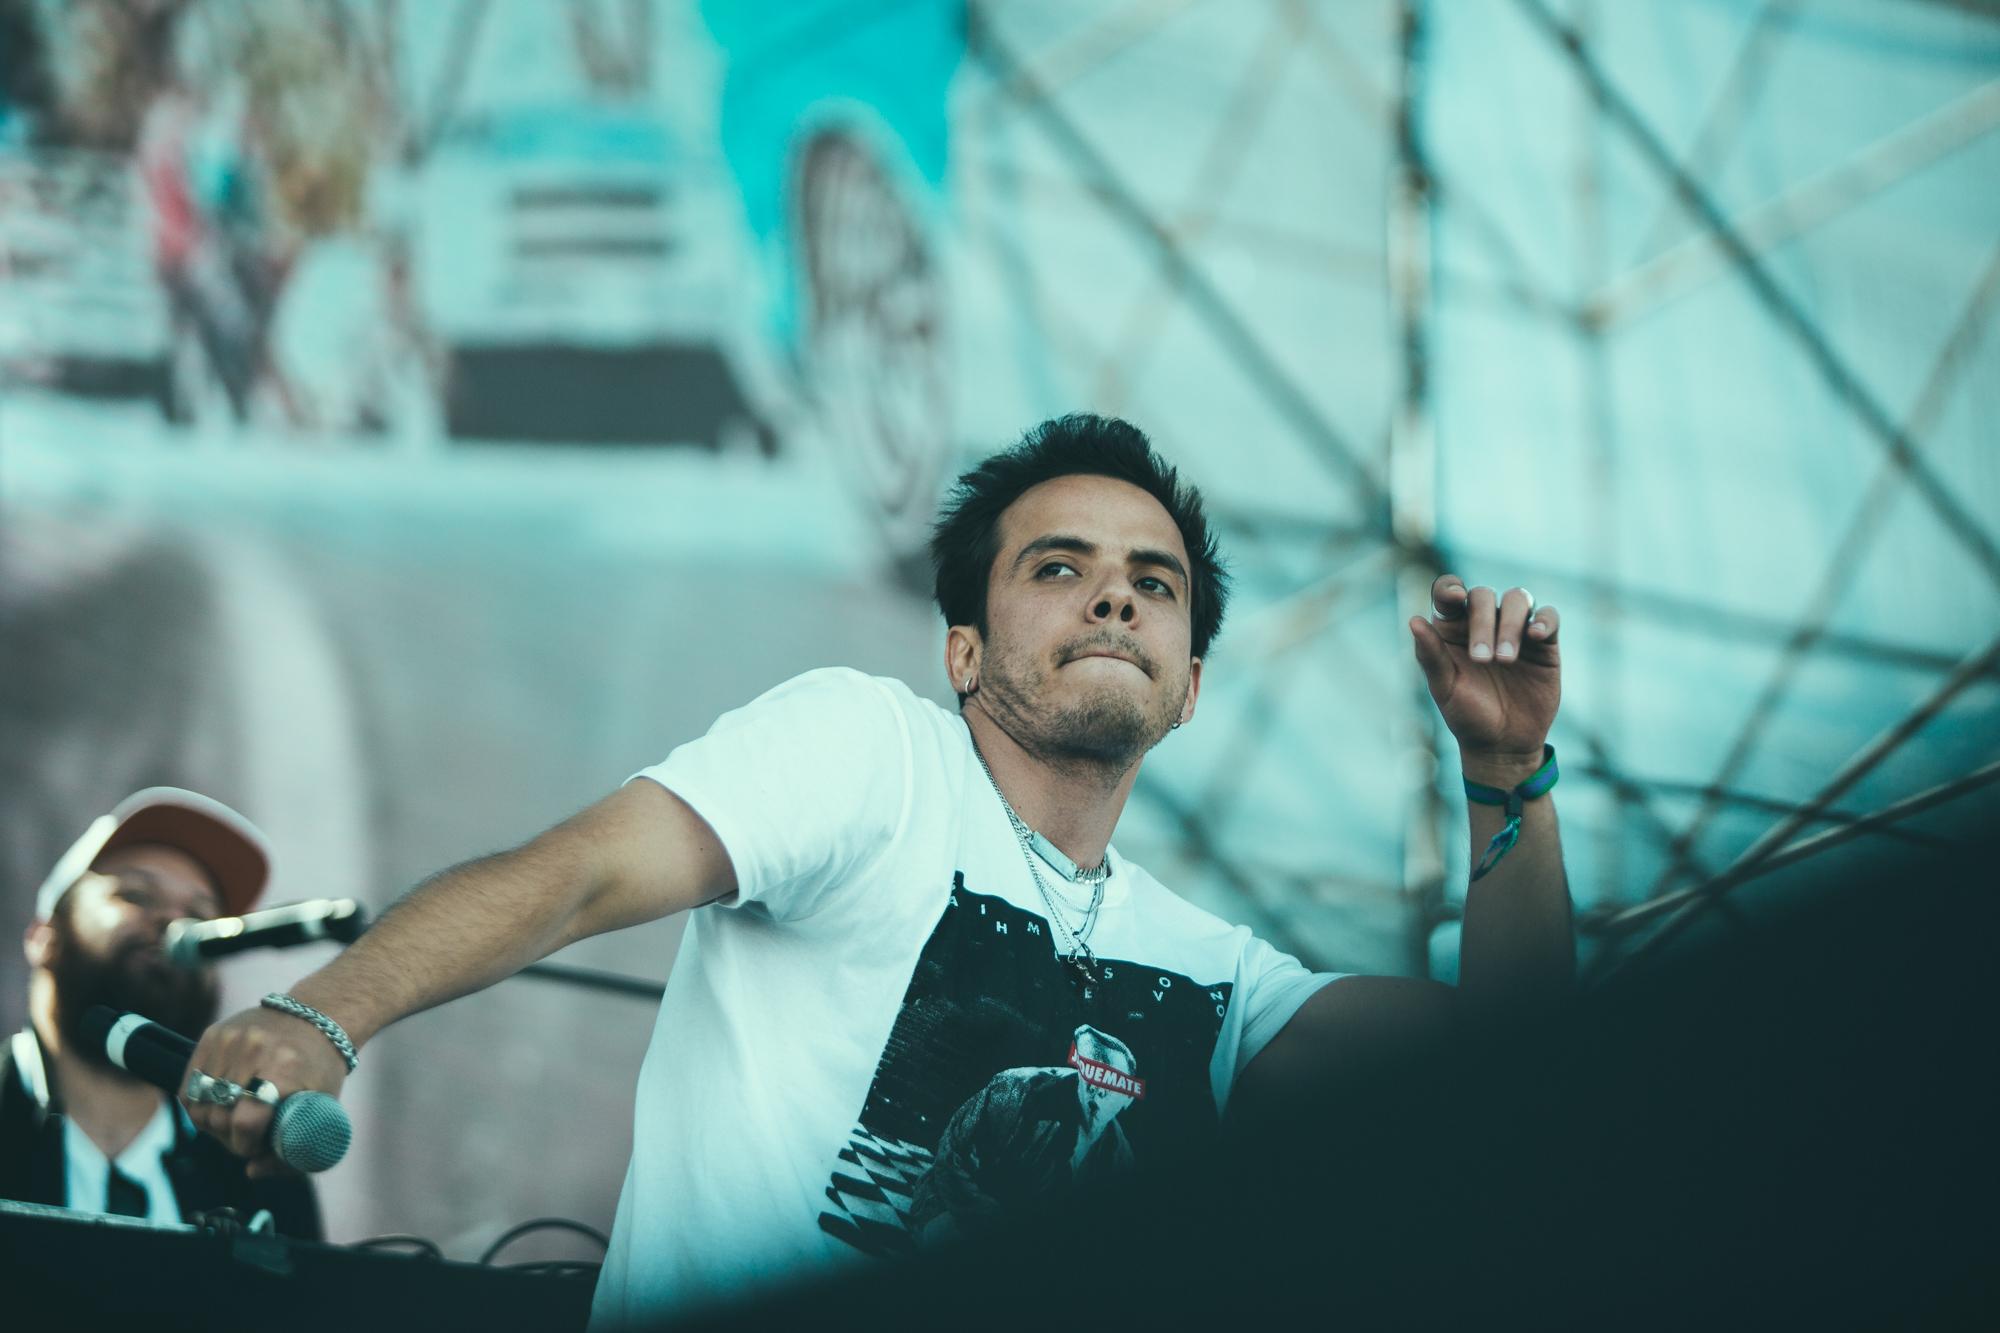 Simpson Ahuevo-Festival Ceremonia-Mexico-Foro Pegaso-04.02.2017-Daniel Patlan_Desde 1989 (16 of 19).jpg